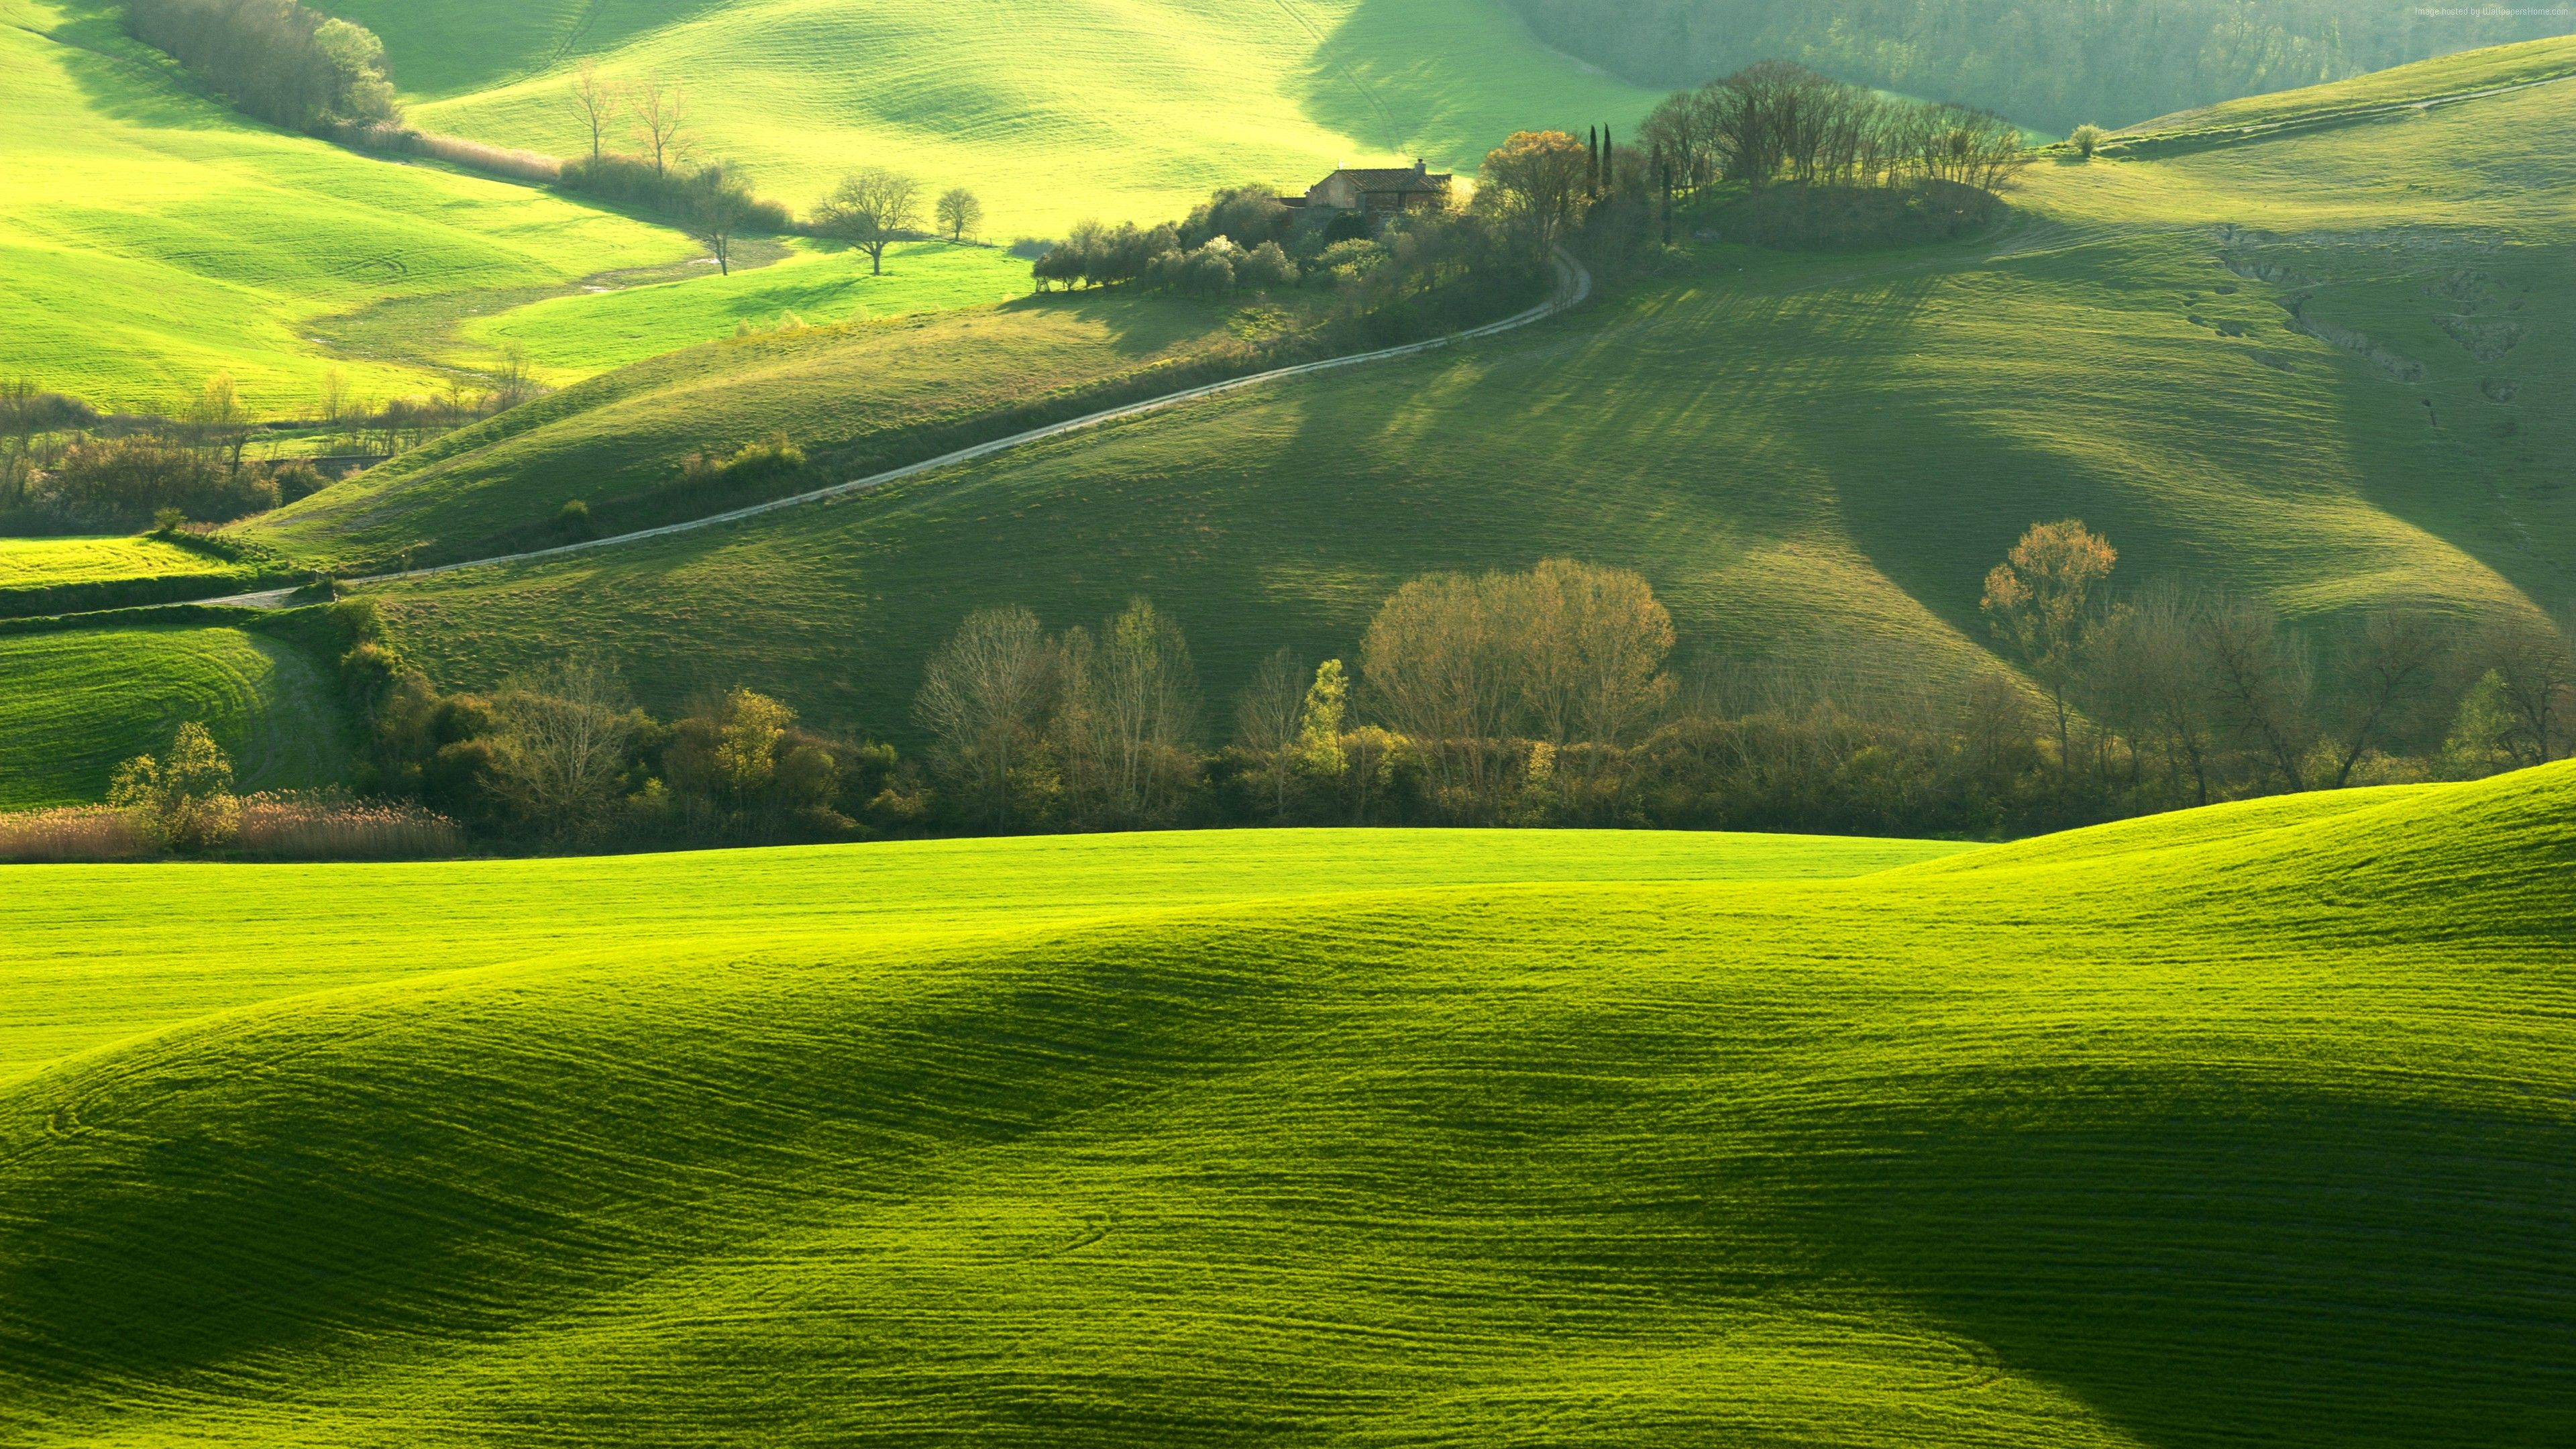 Wallpaper Tuscany Italy Europe Hills Green Field 8k Travel Hd Nature Wallpapers Nature Wallpaper Nature